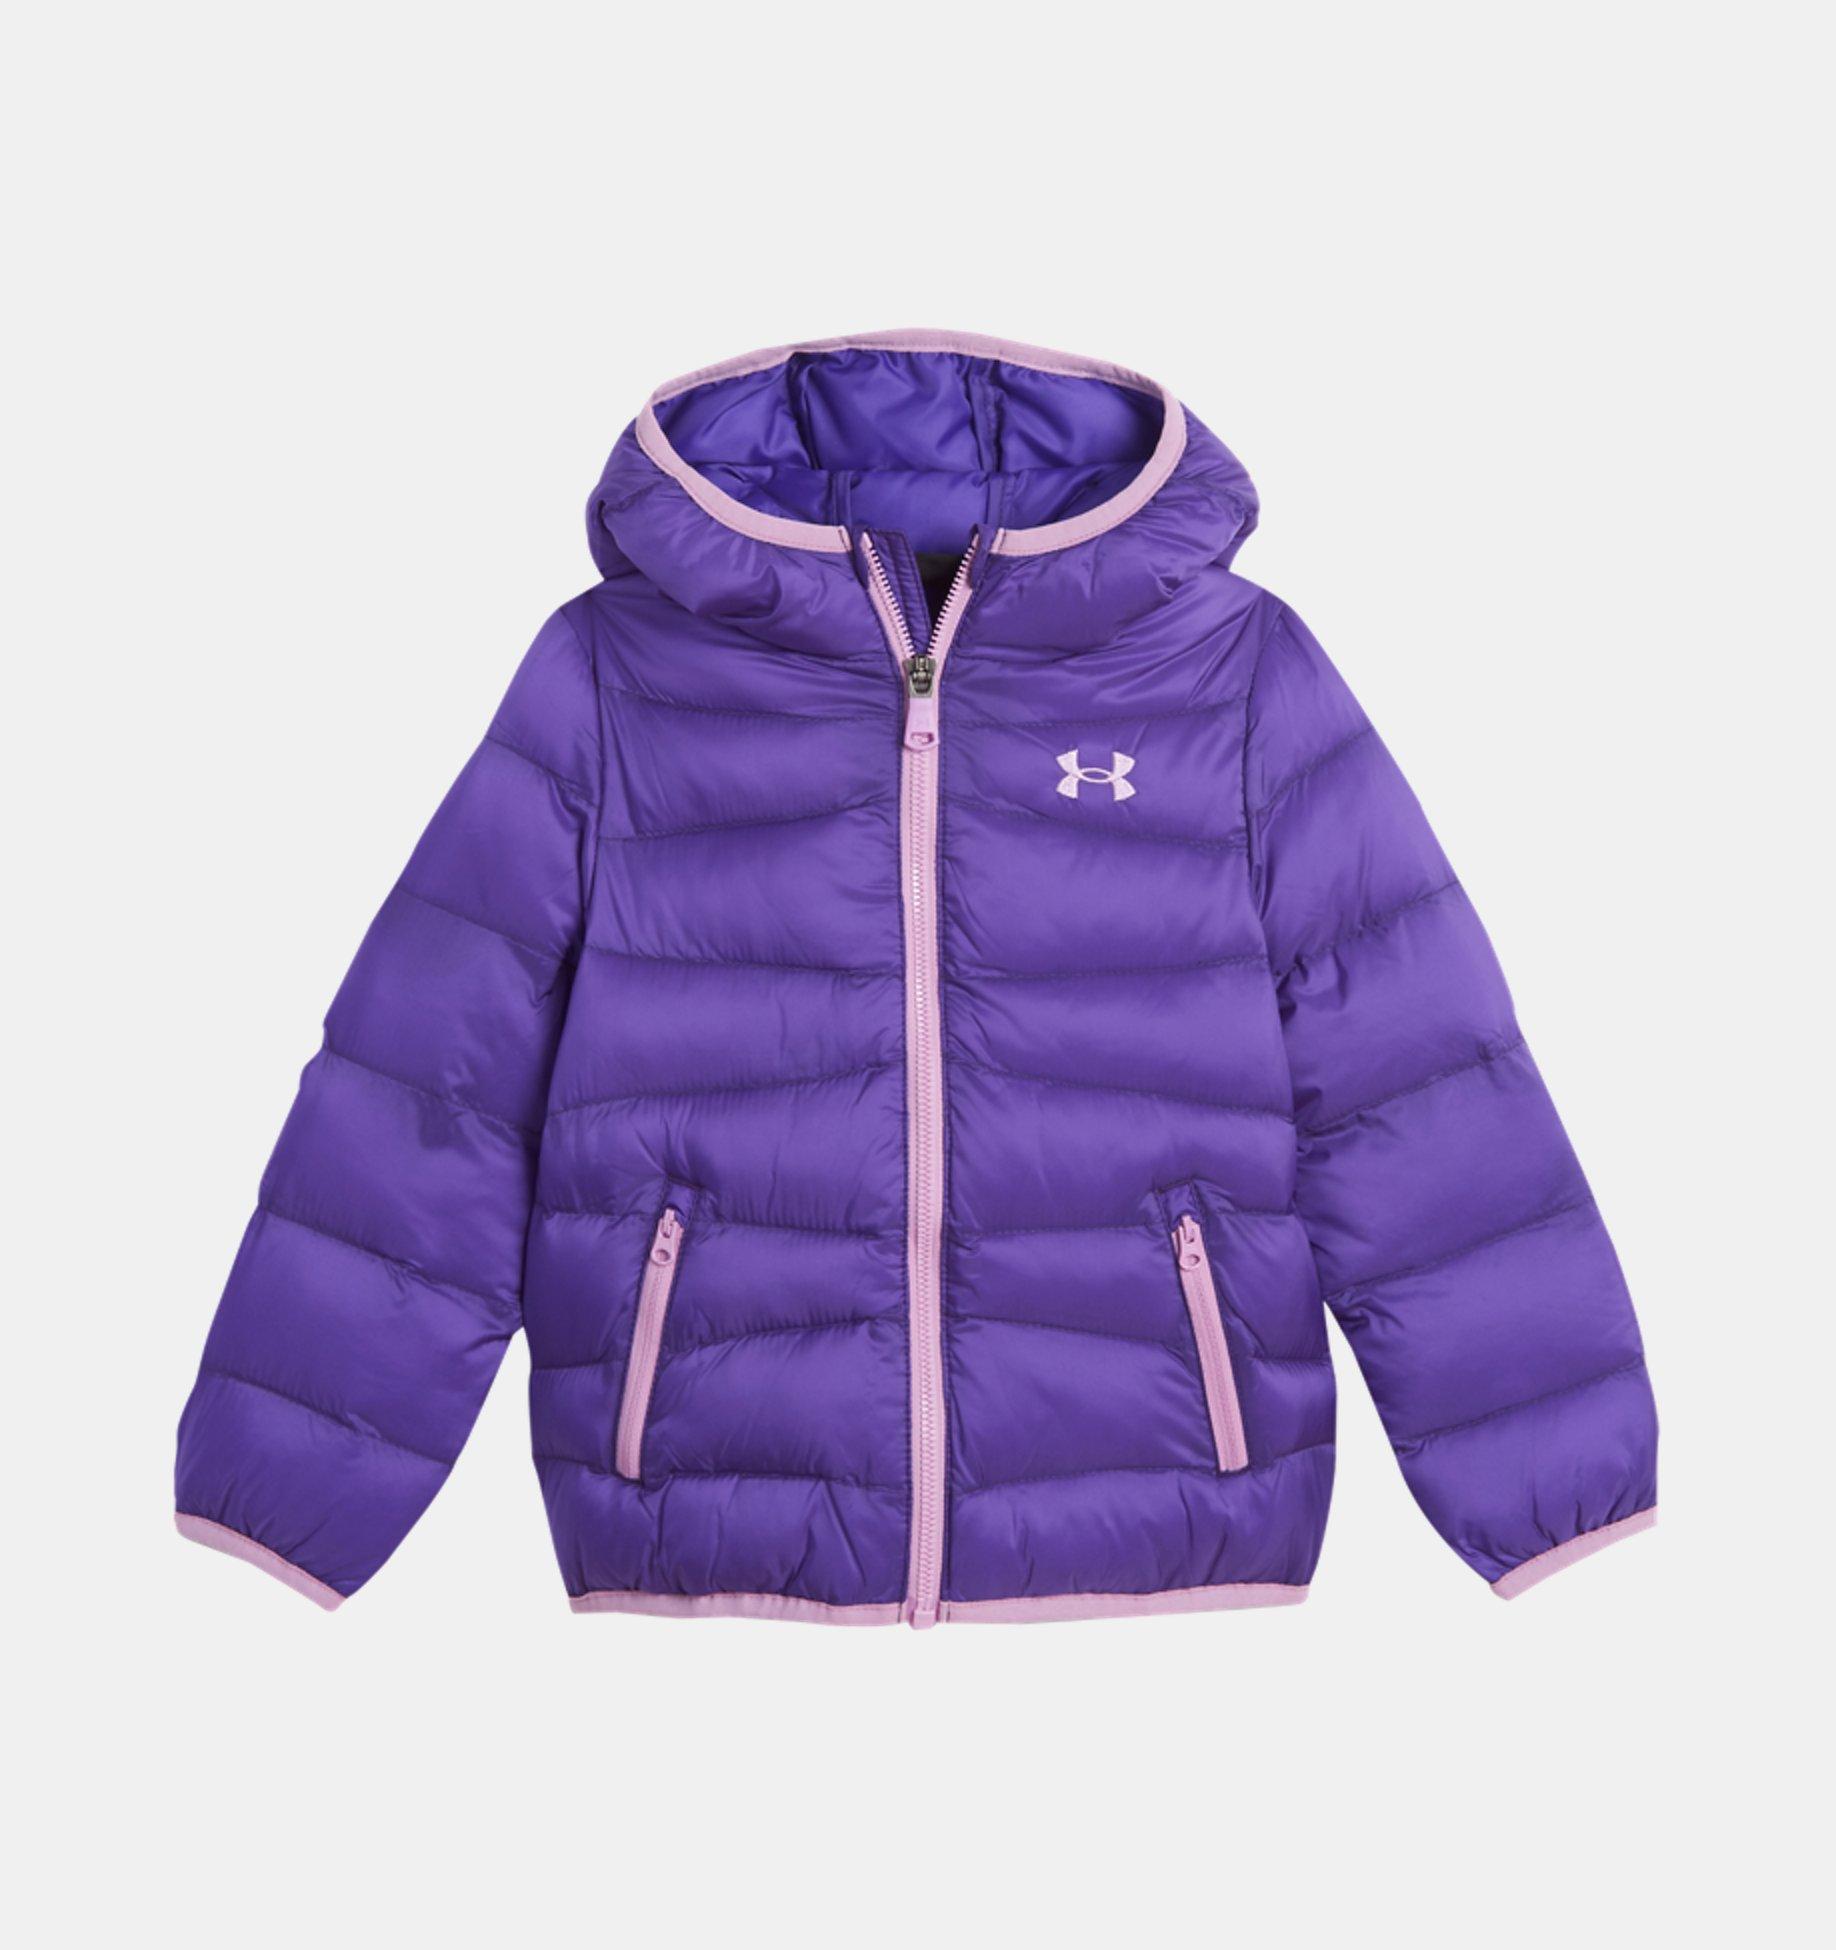 Underarmour Girls Infant UA Prime Puffer Jacket